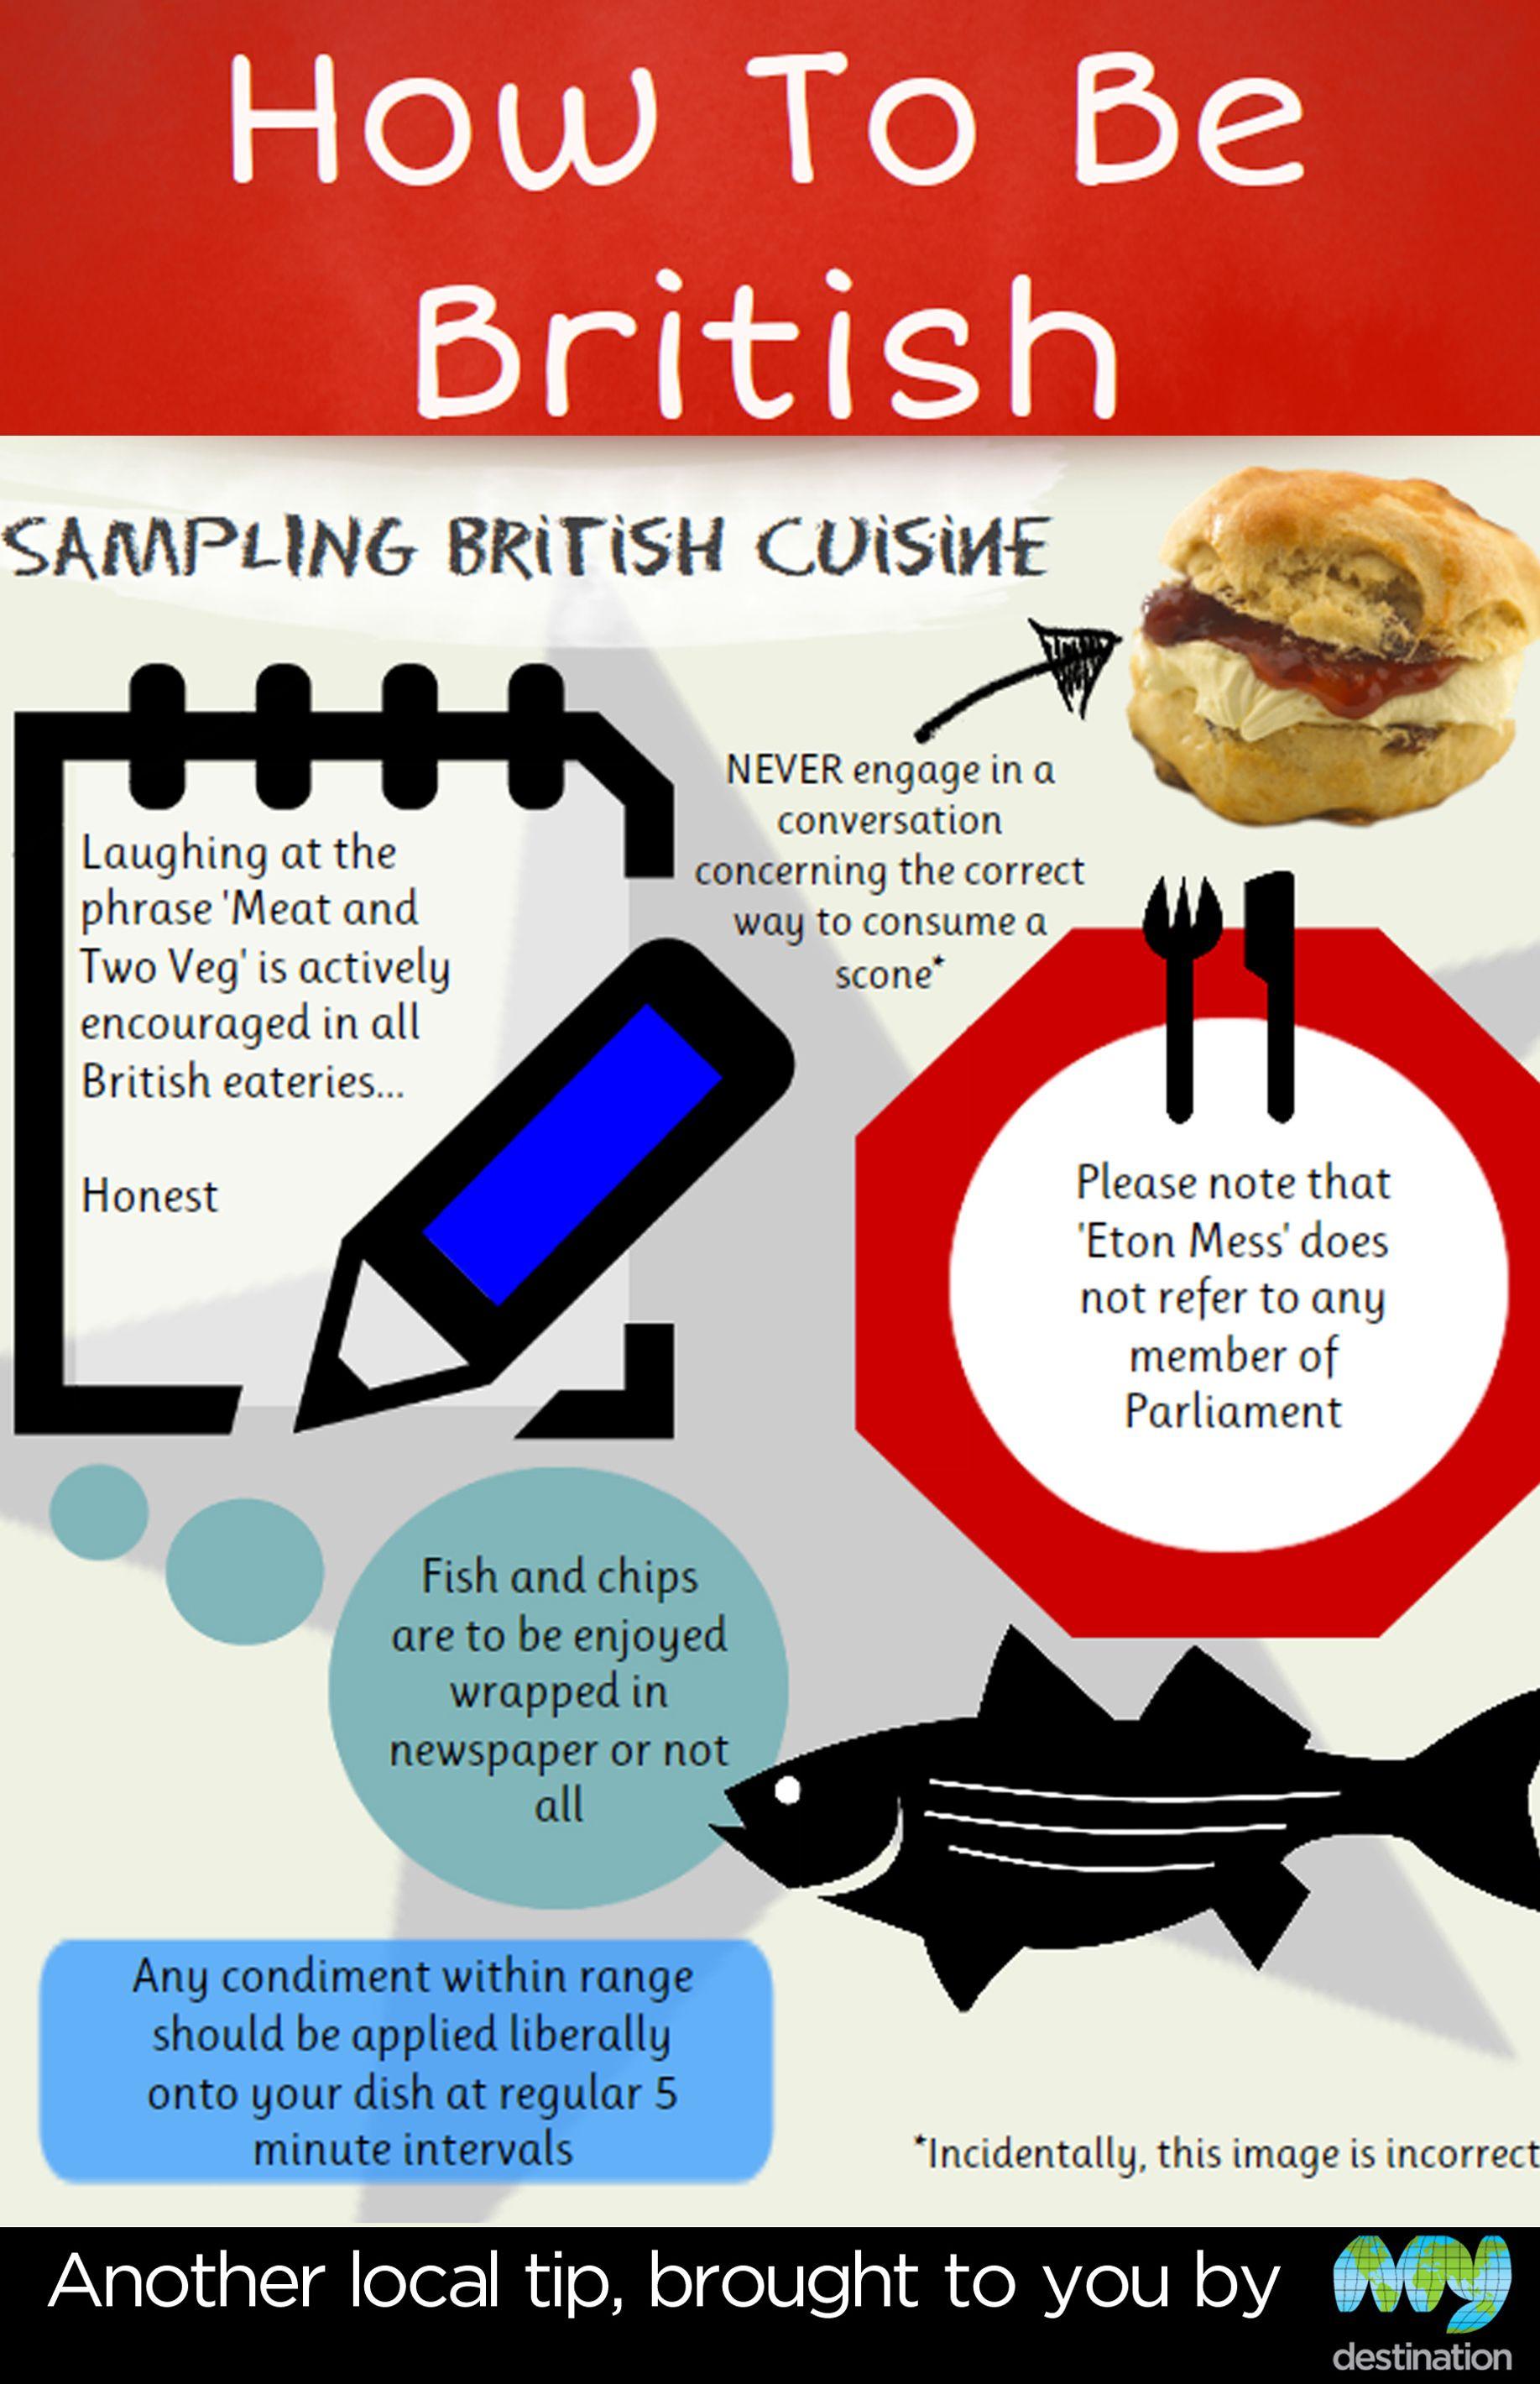 How To Be British - Sampling British Cuisine - it forgot to